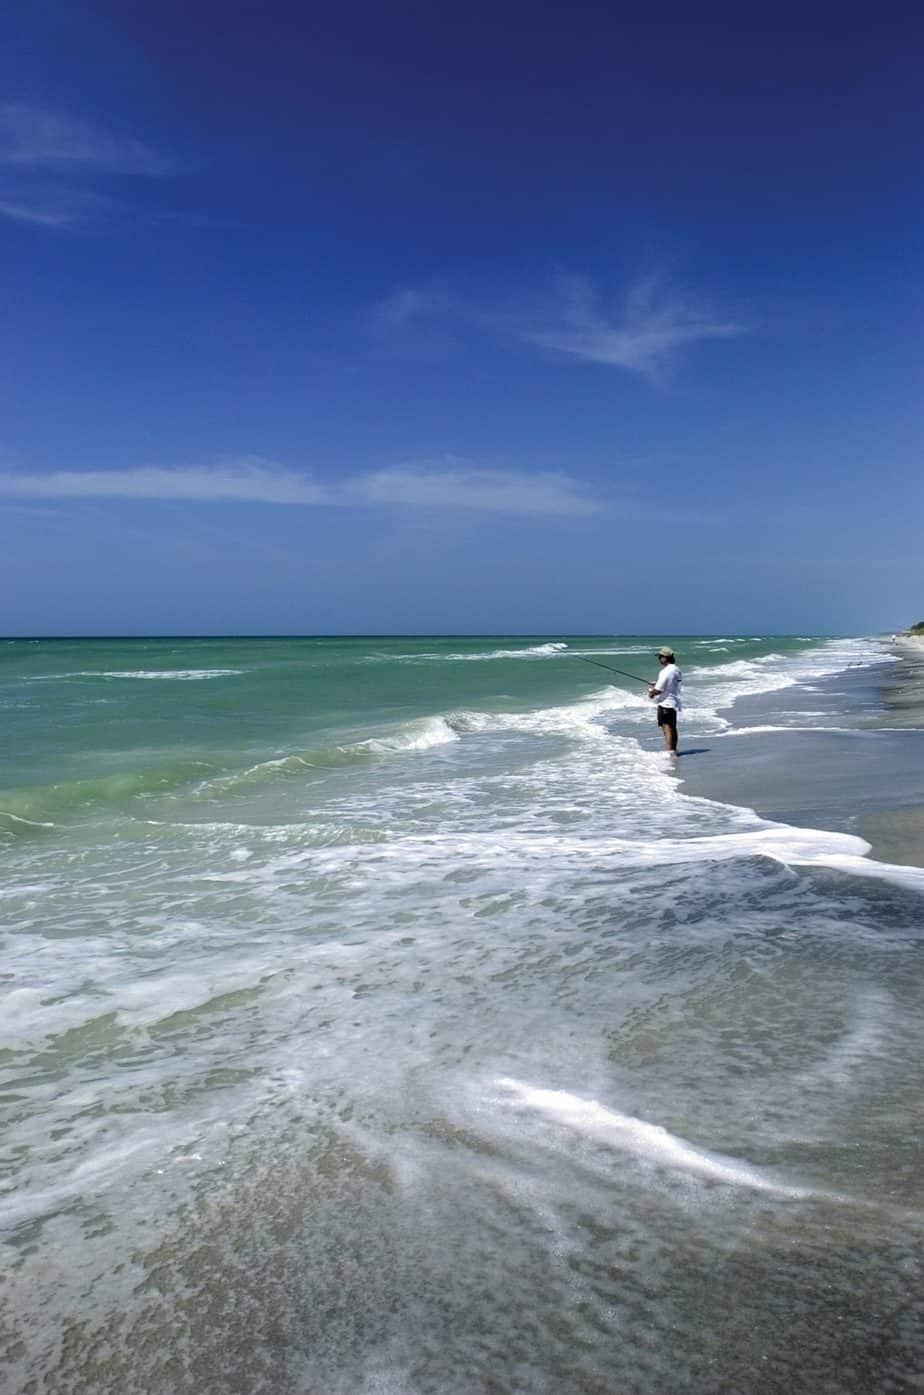 Surf Fishing Basics: Family fun at the beach